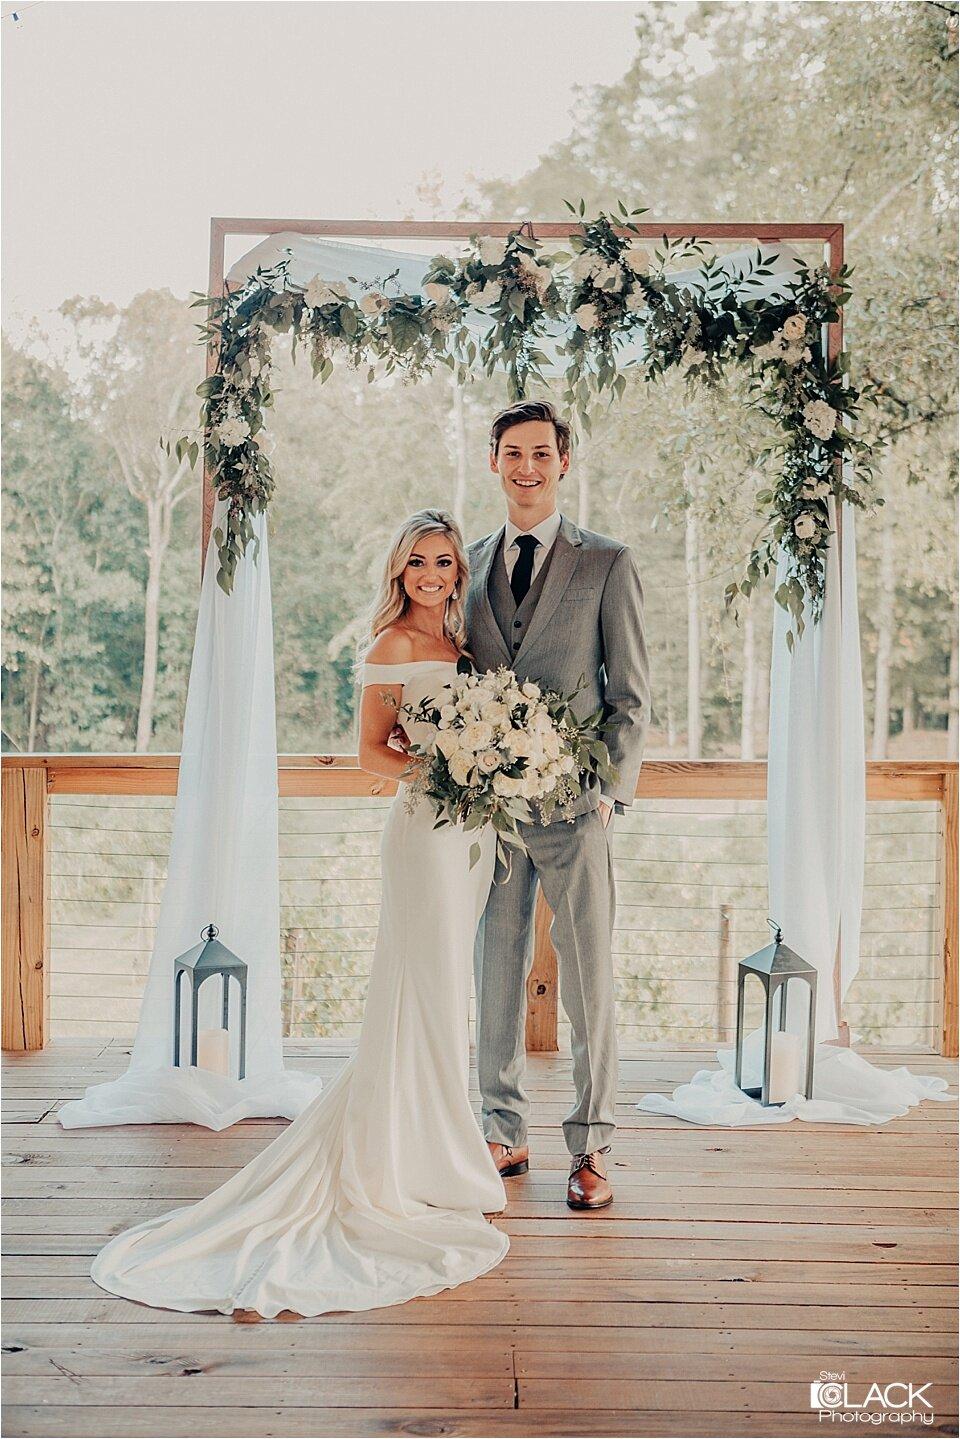 Atlanta wedding Photographer Stevi clack Photography_2452.jpg